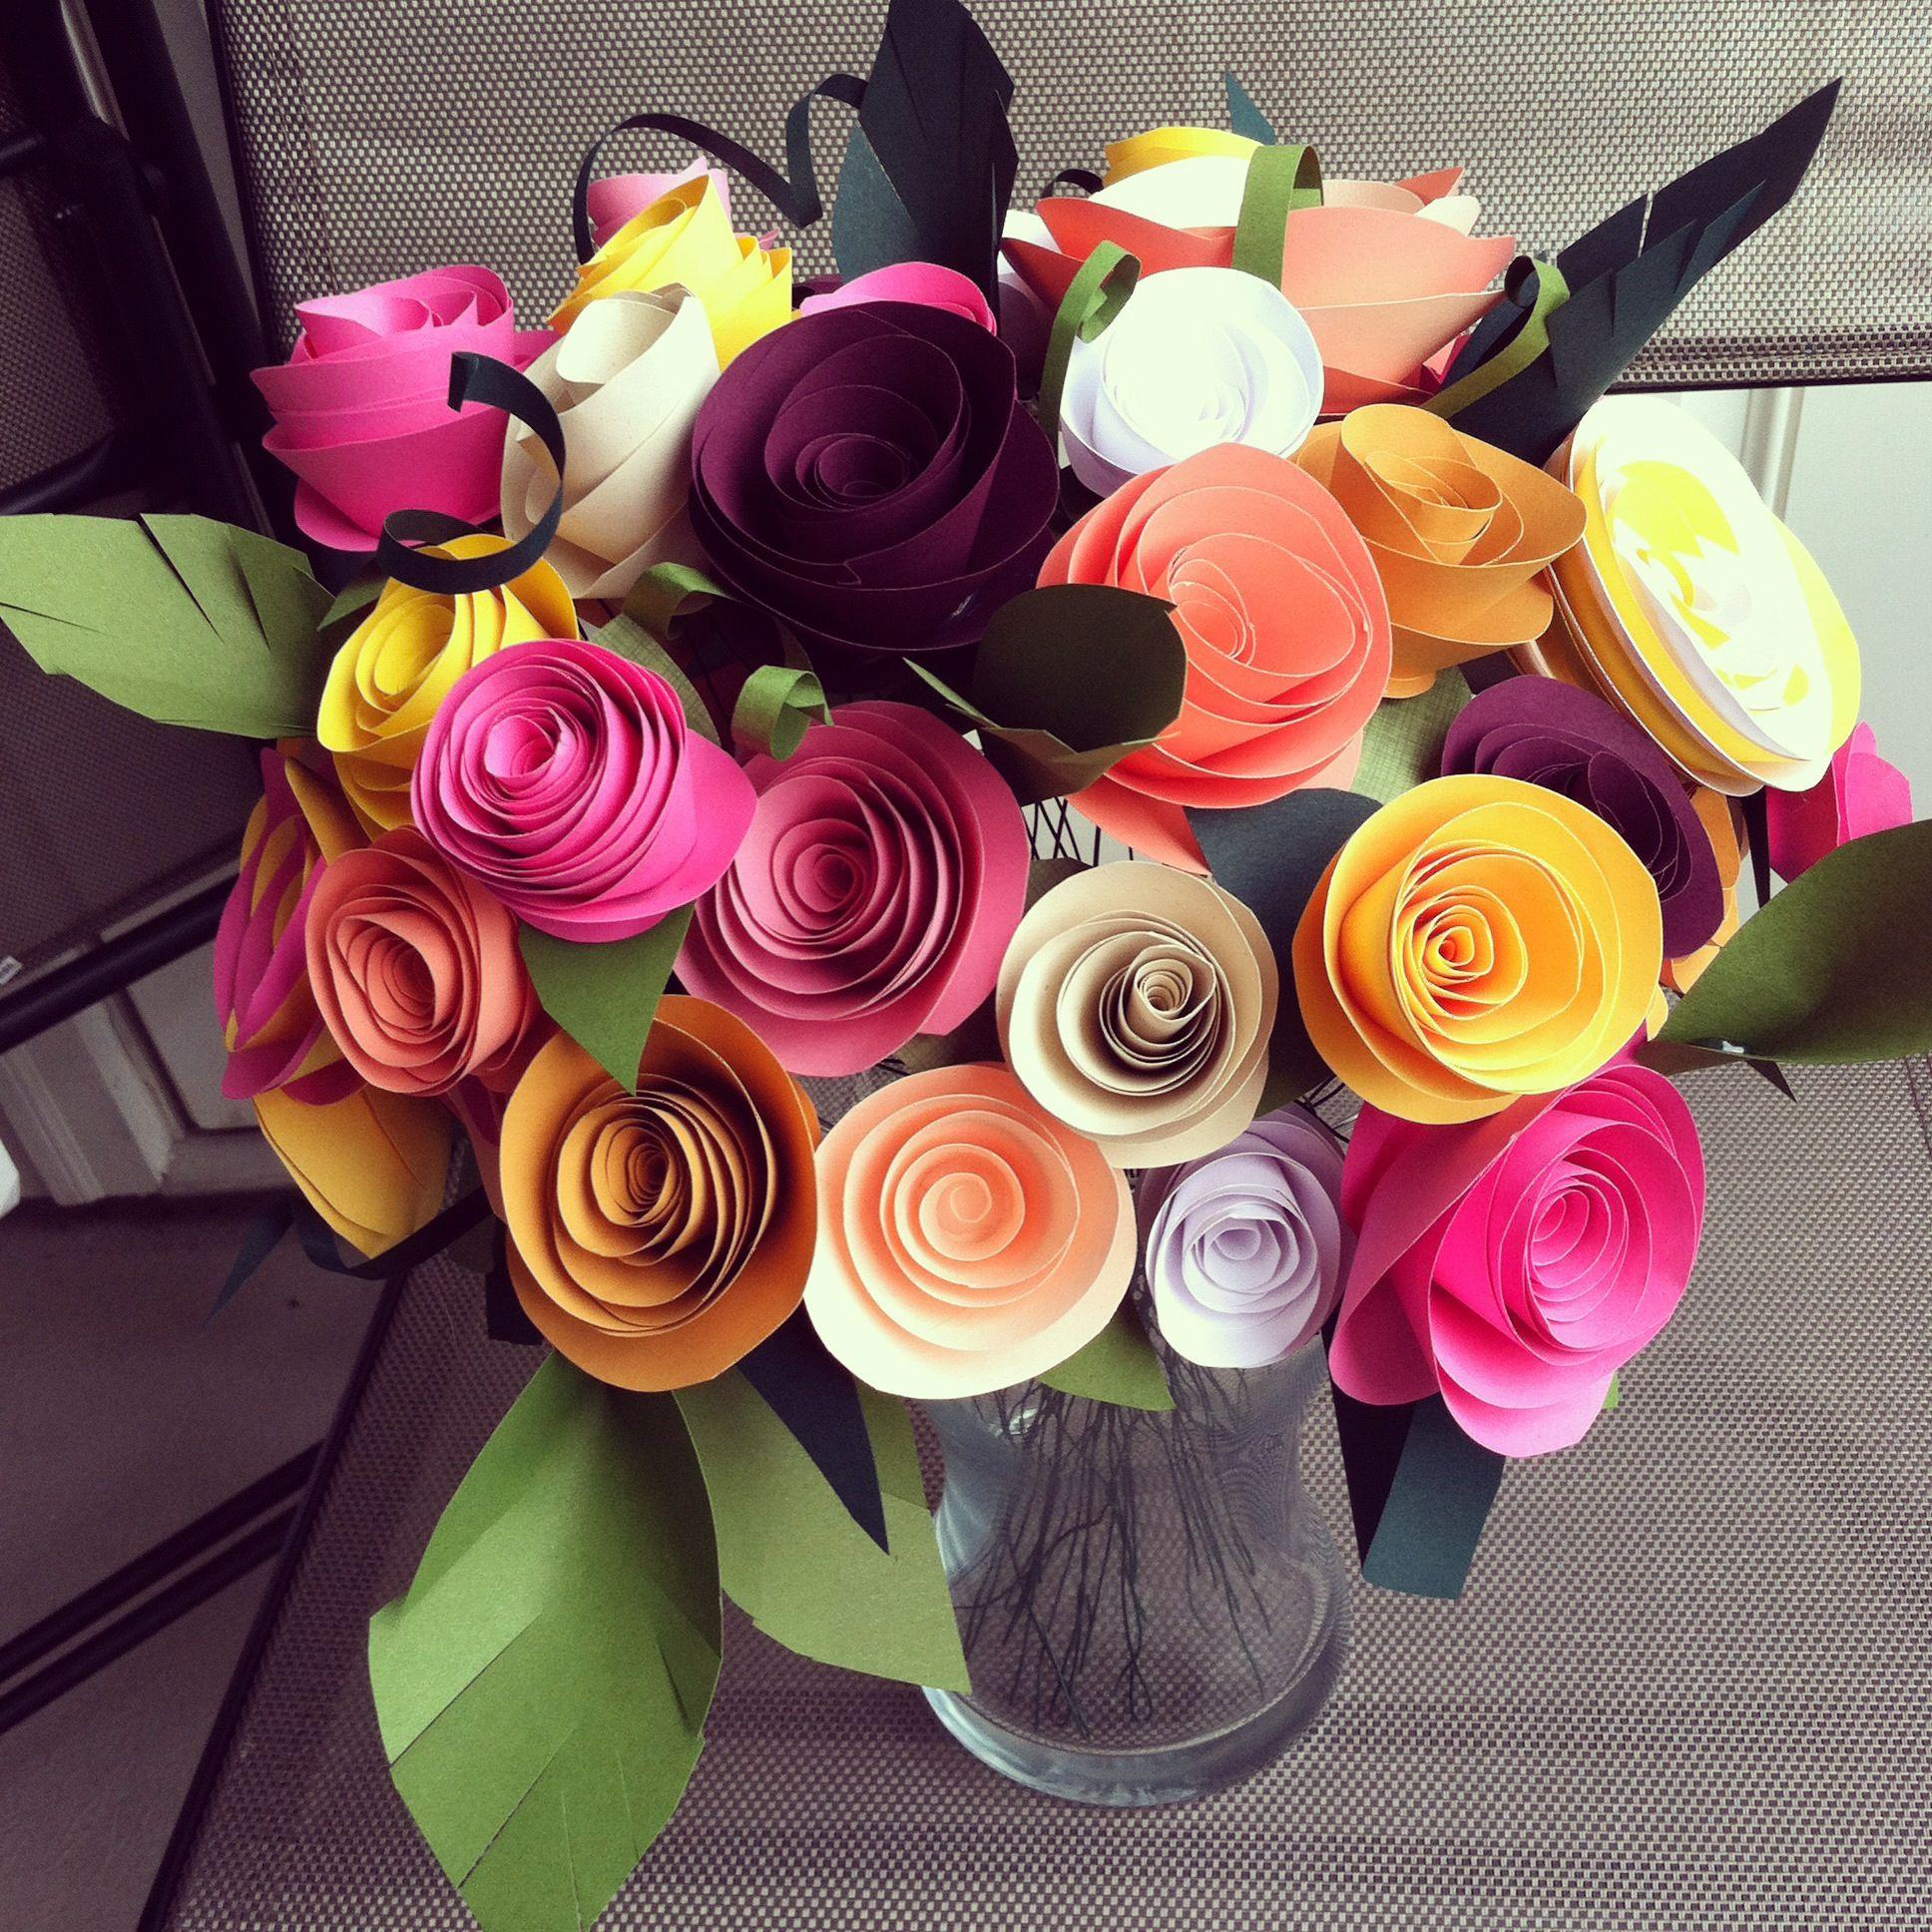 handmade paper flowers. | Pinterest | Flower bouquets, Flower and ...